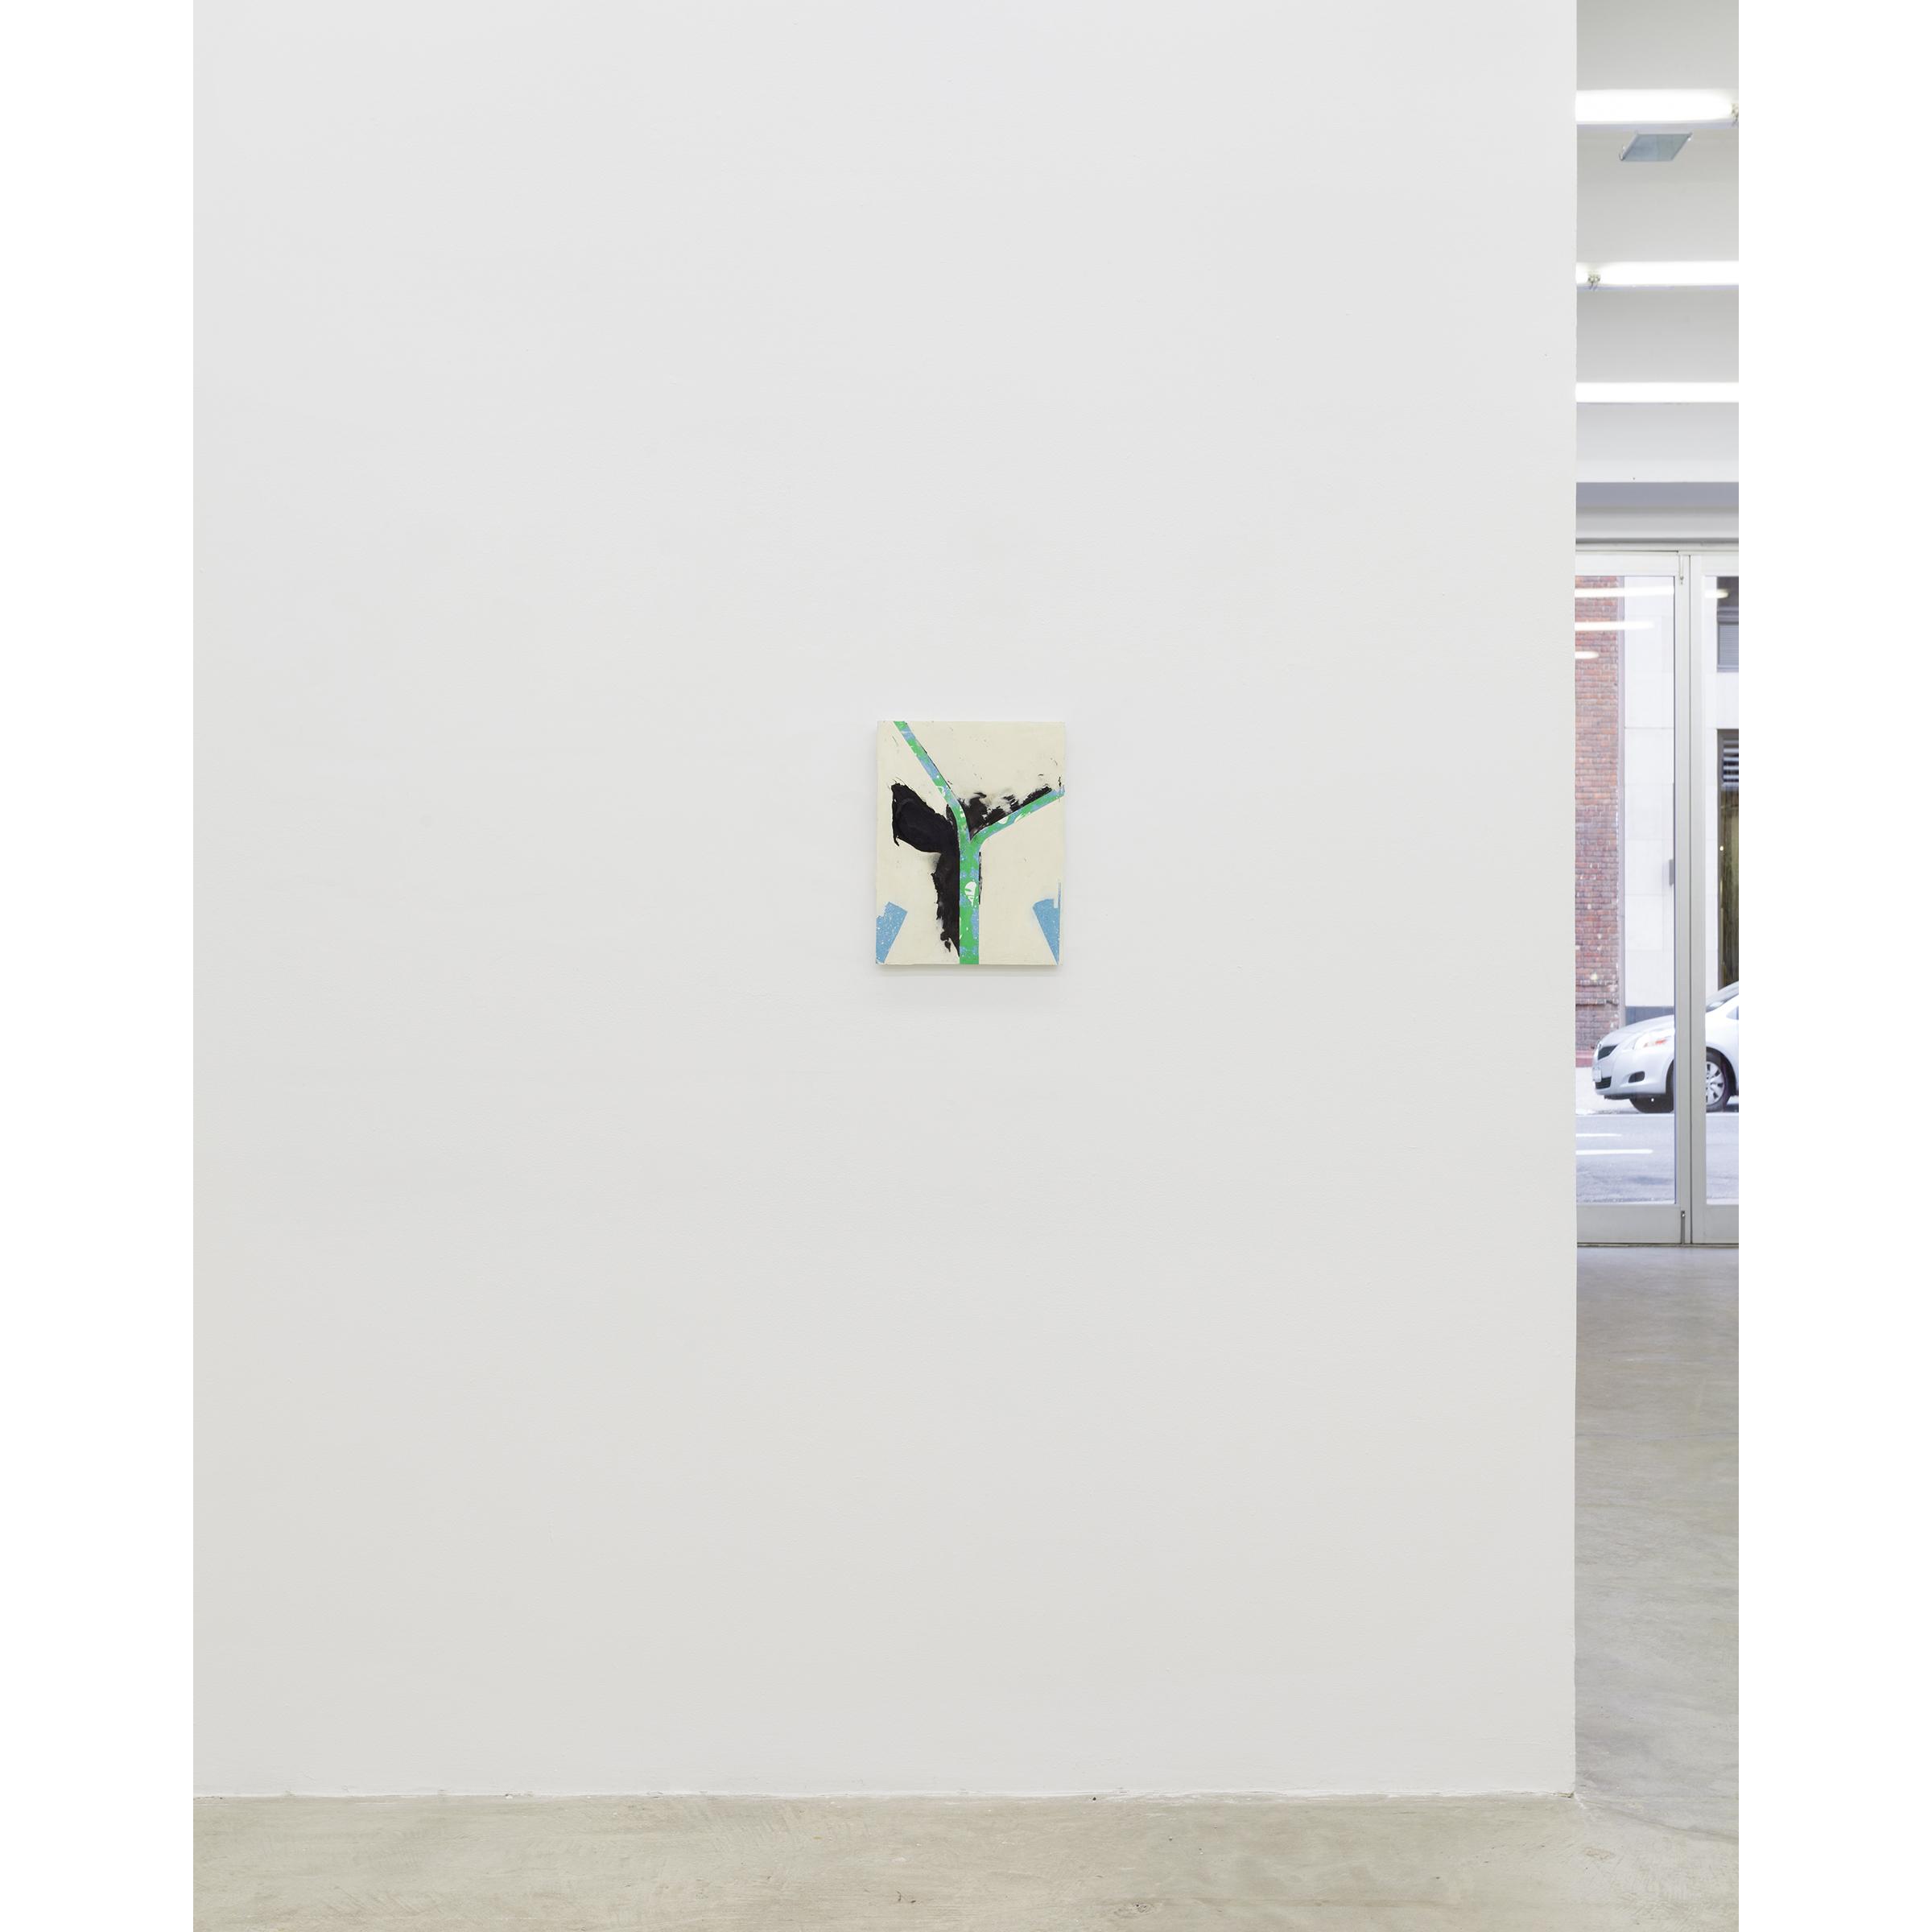 Installation view, Thick Pink, Stuffed Light, Martos Gallery, New York,2014